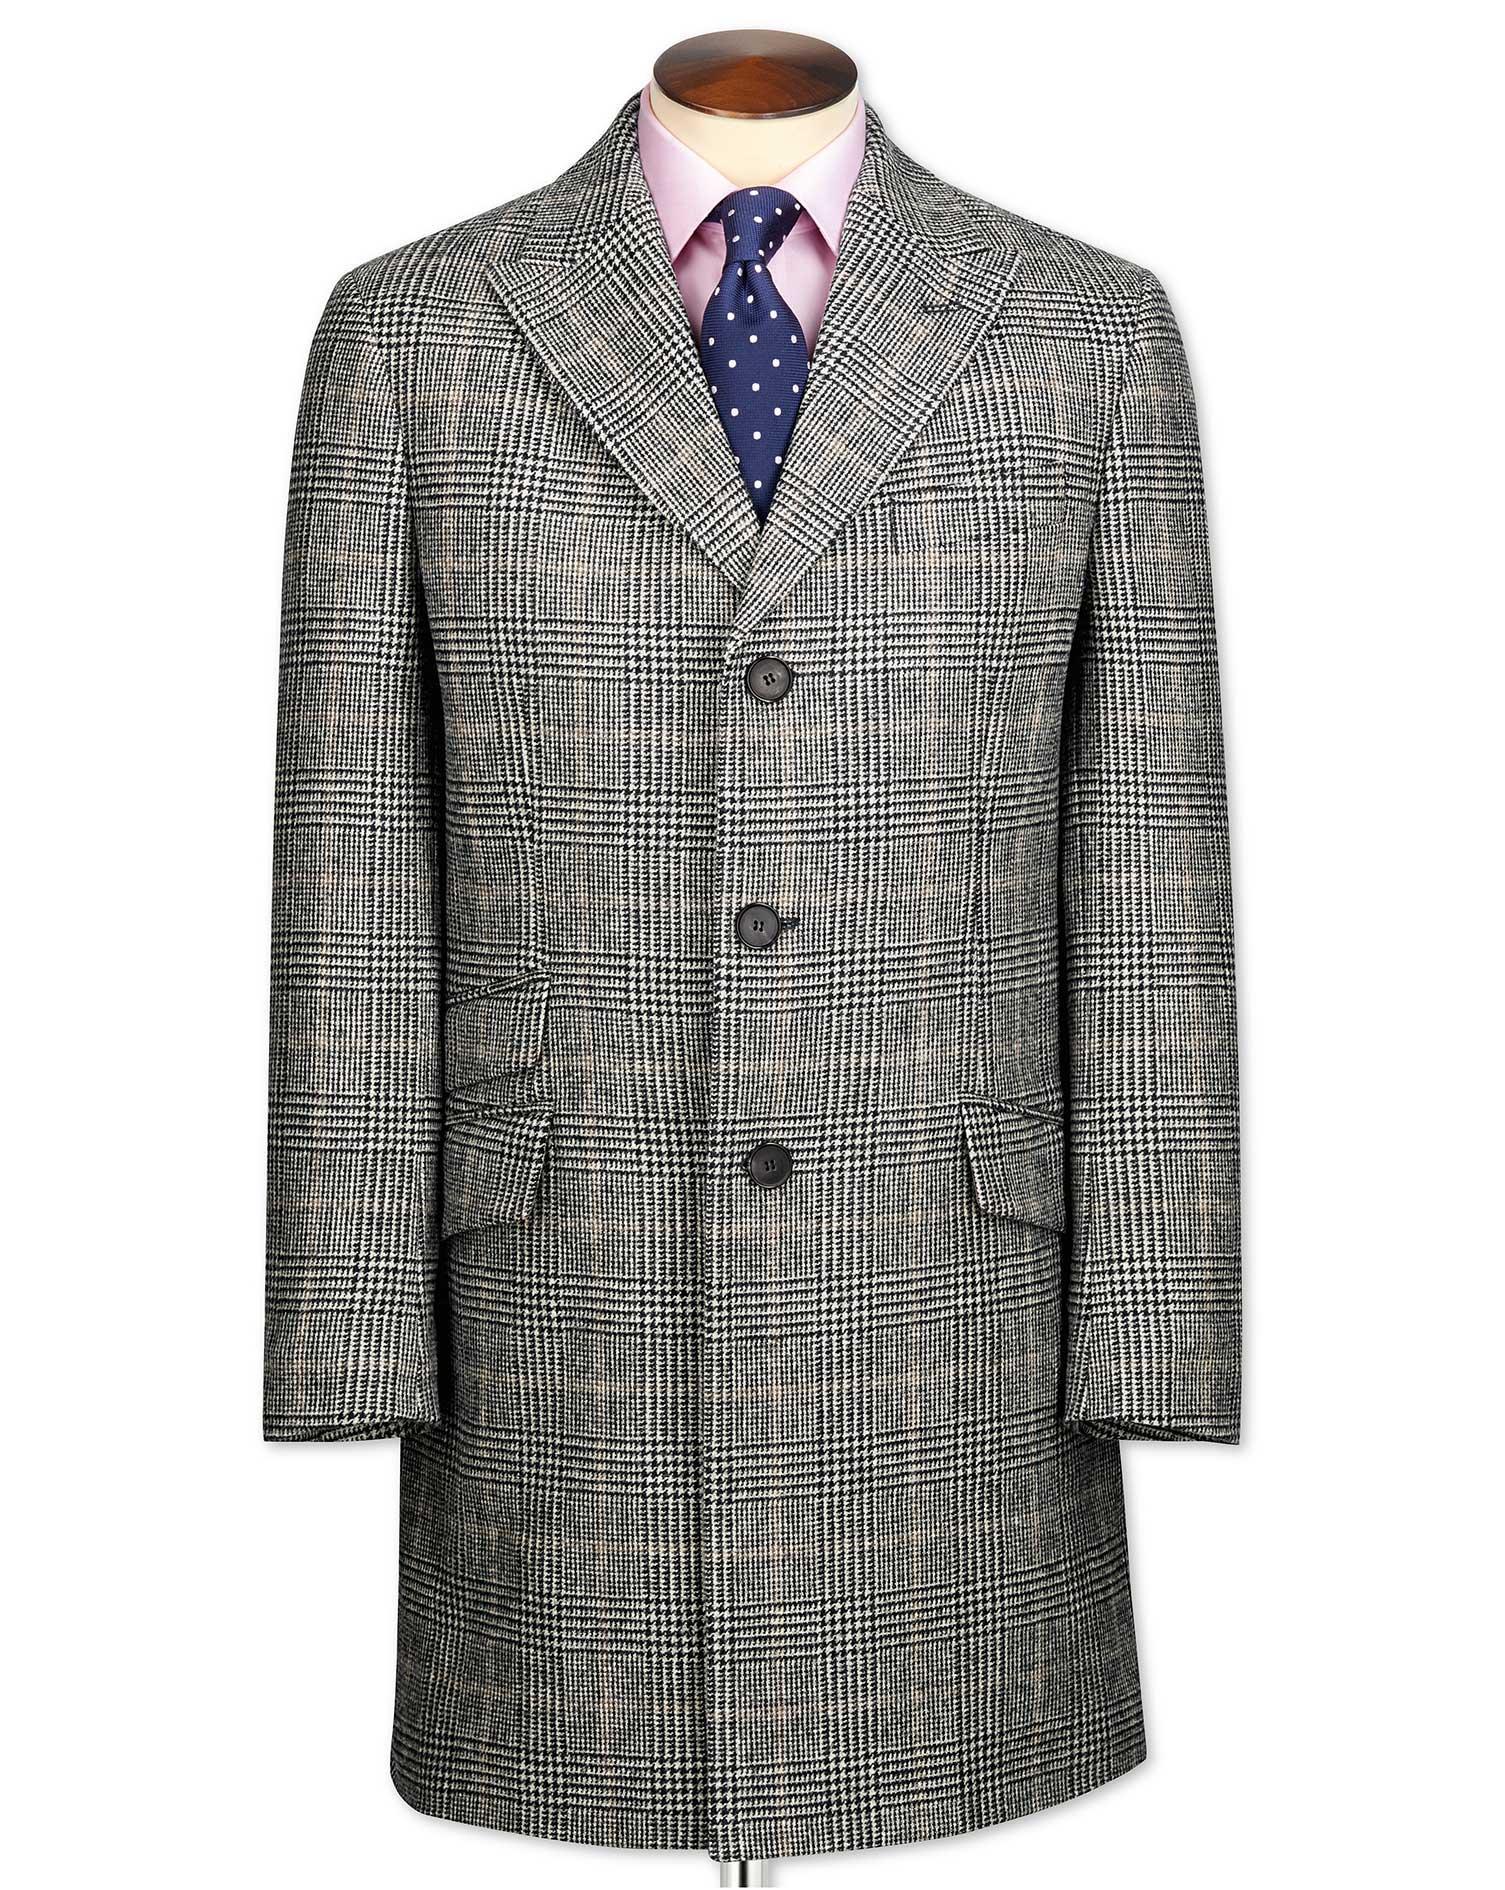 Grey Checkered Wool Epsom OverWool coat Size 44 Regular by Charles Tyrwhitt